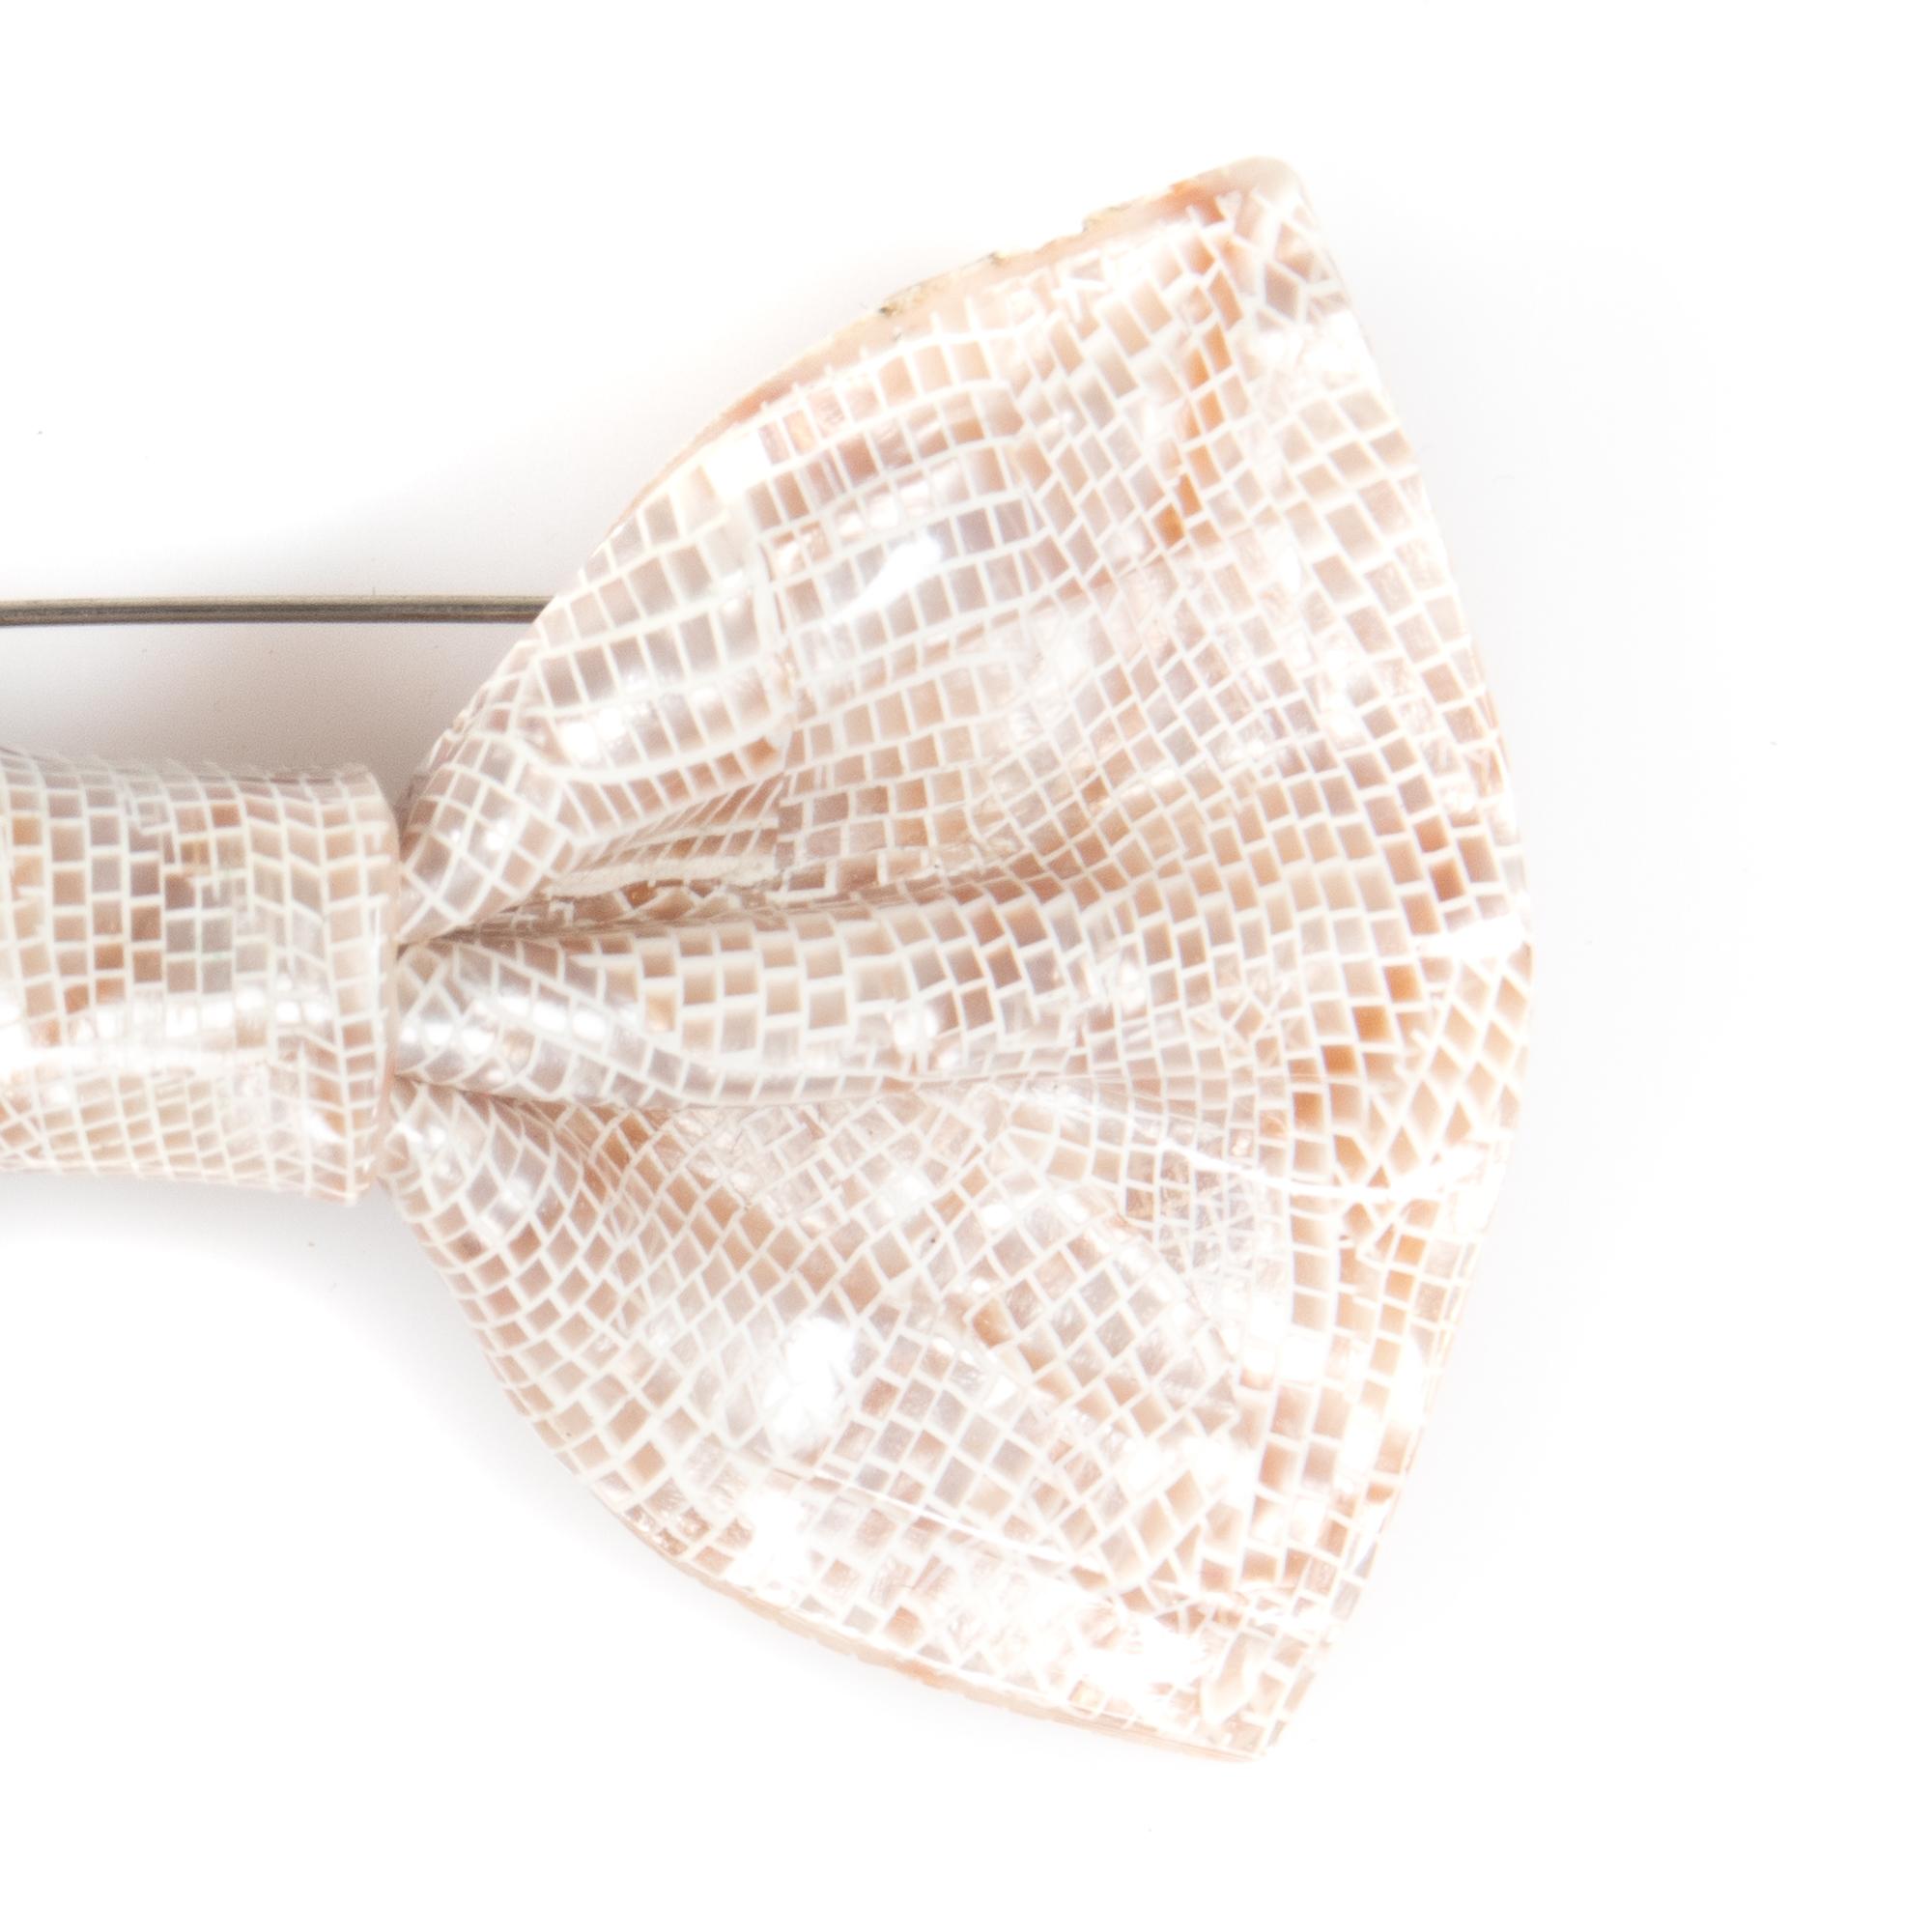 Lea Stein Signed Paris Bakelite Designer Brooch - Image 2 of 6